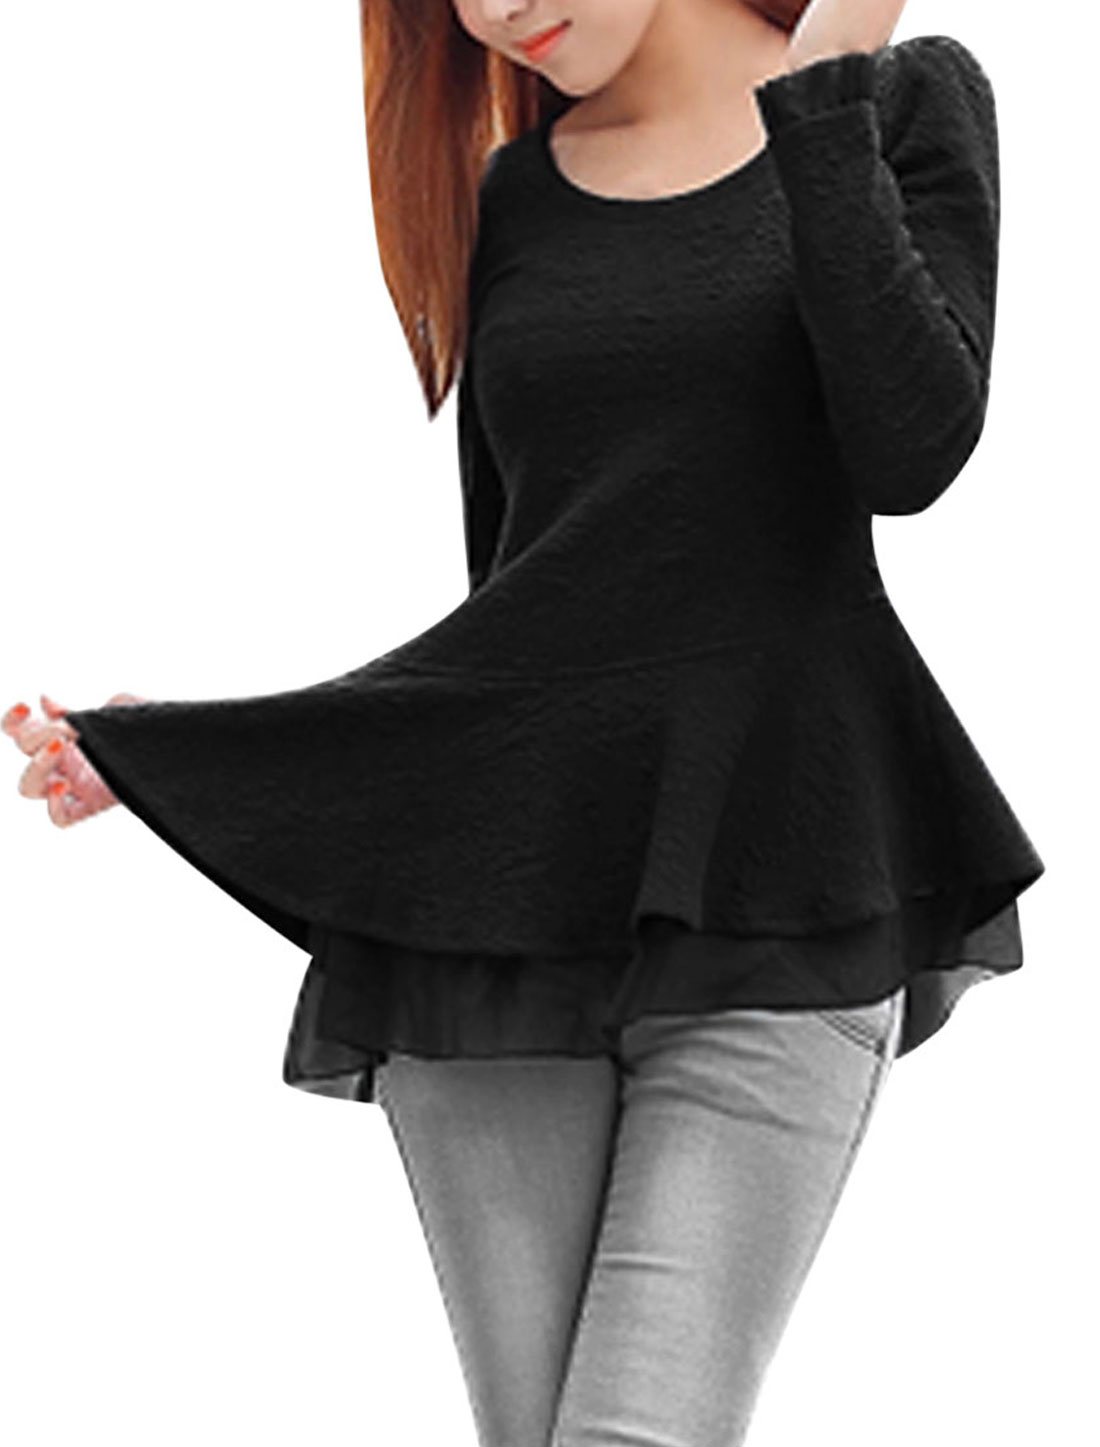 Ladies Black Pullover Chiffon Splice Texture Cut Out Back Peplum Top S